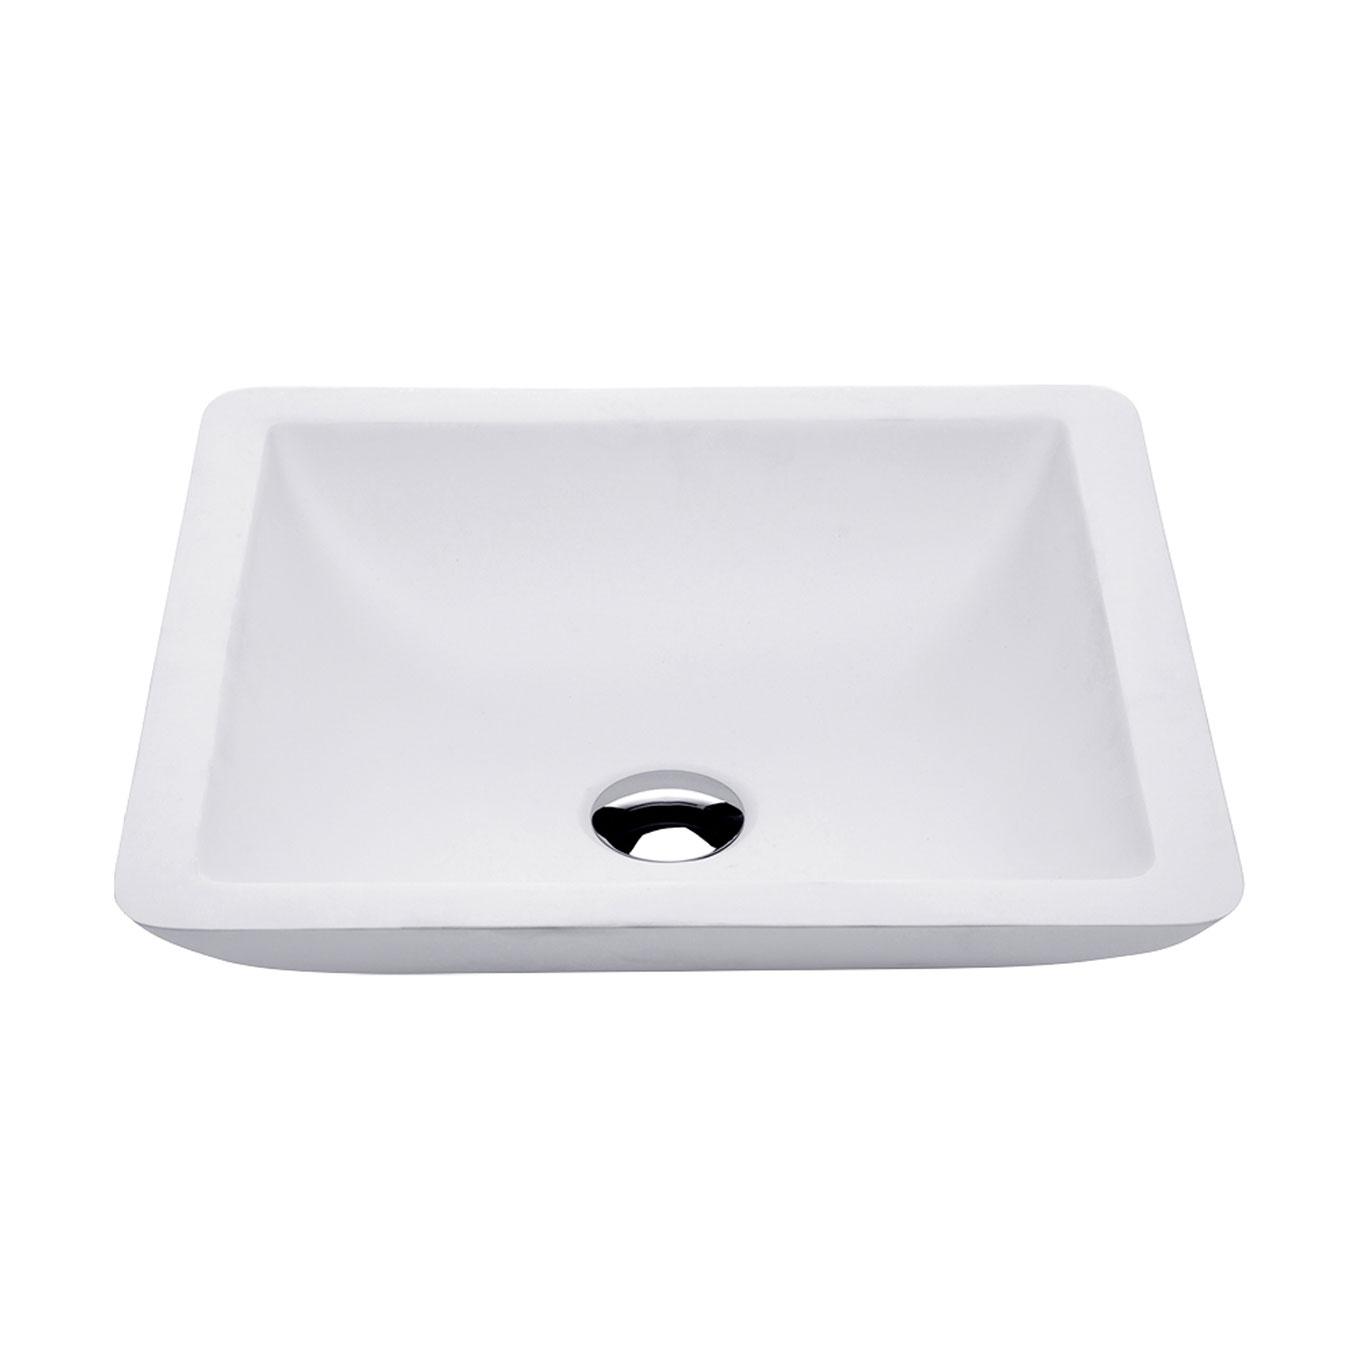 FIENZA CLASSIQUE MATT WHITE SOLID SURFACE BASIN 420X420MM